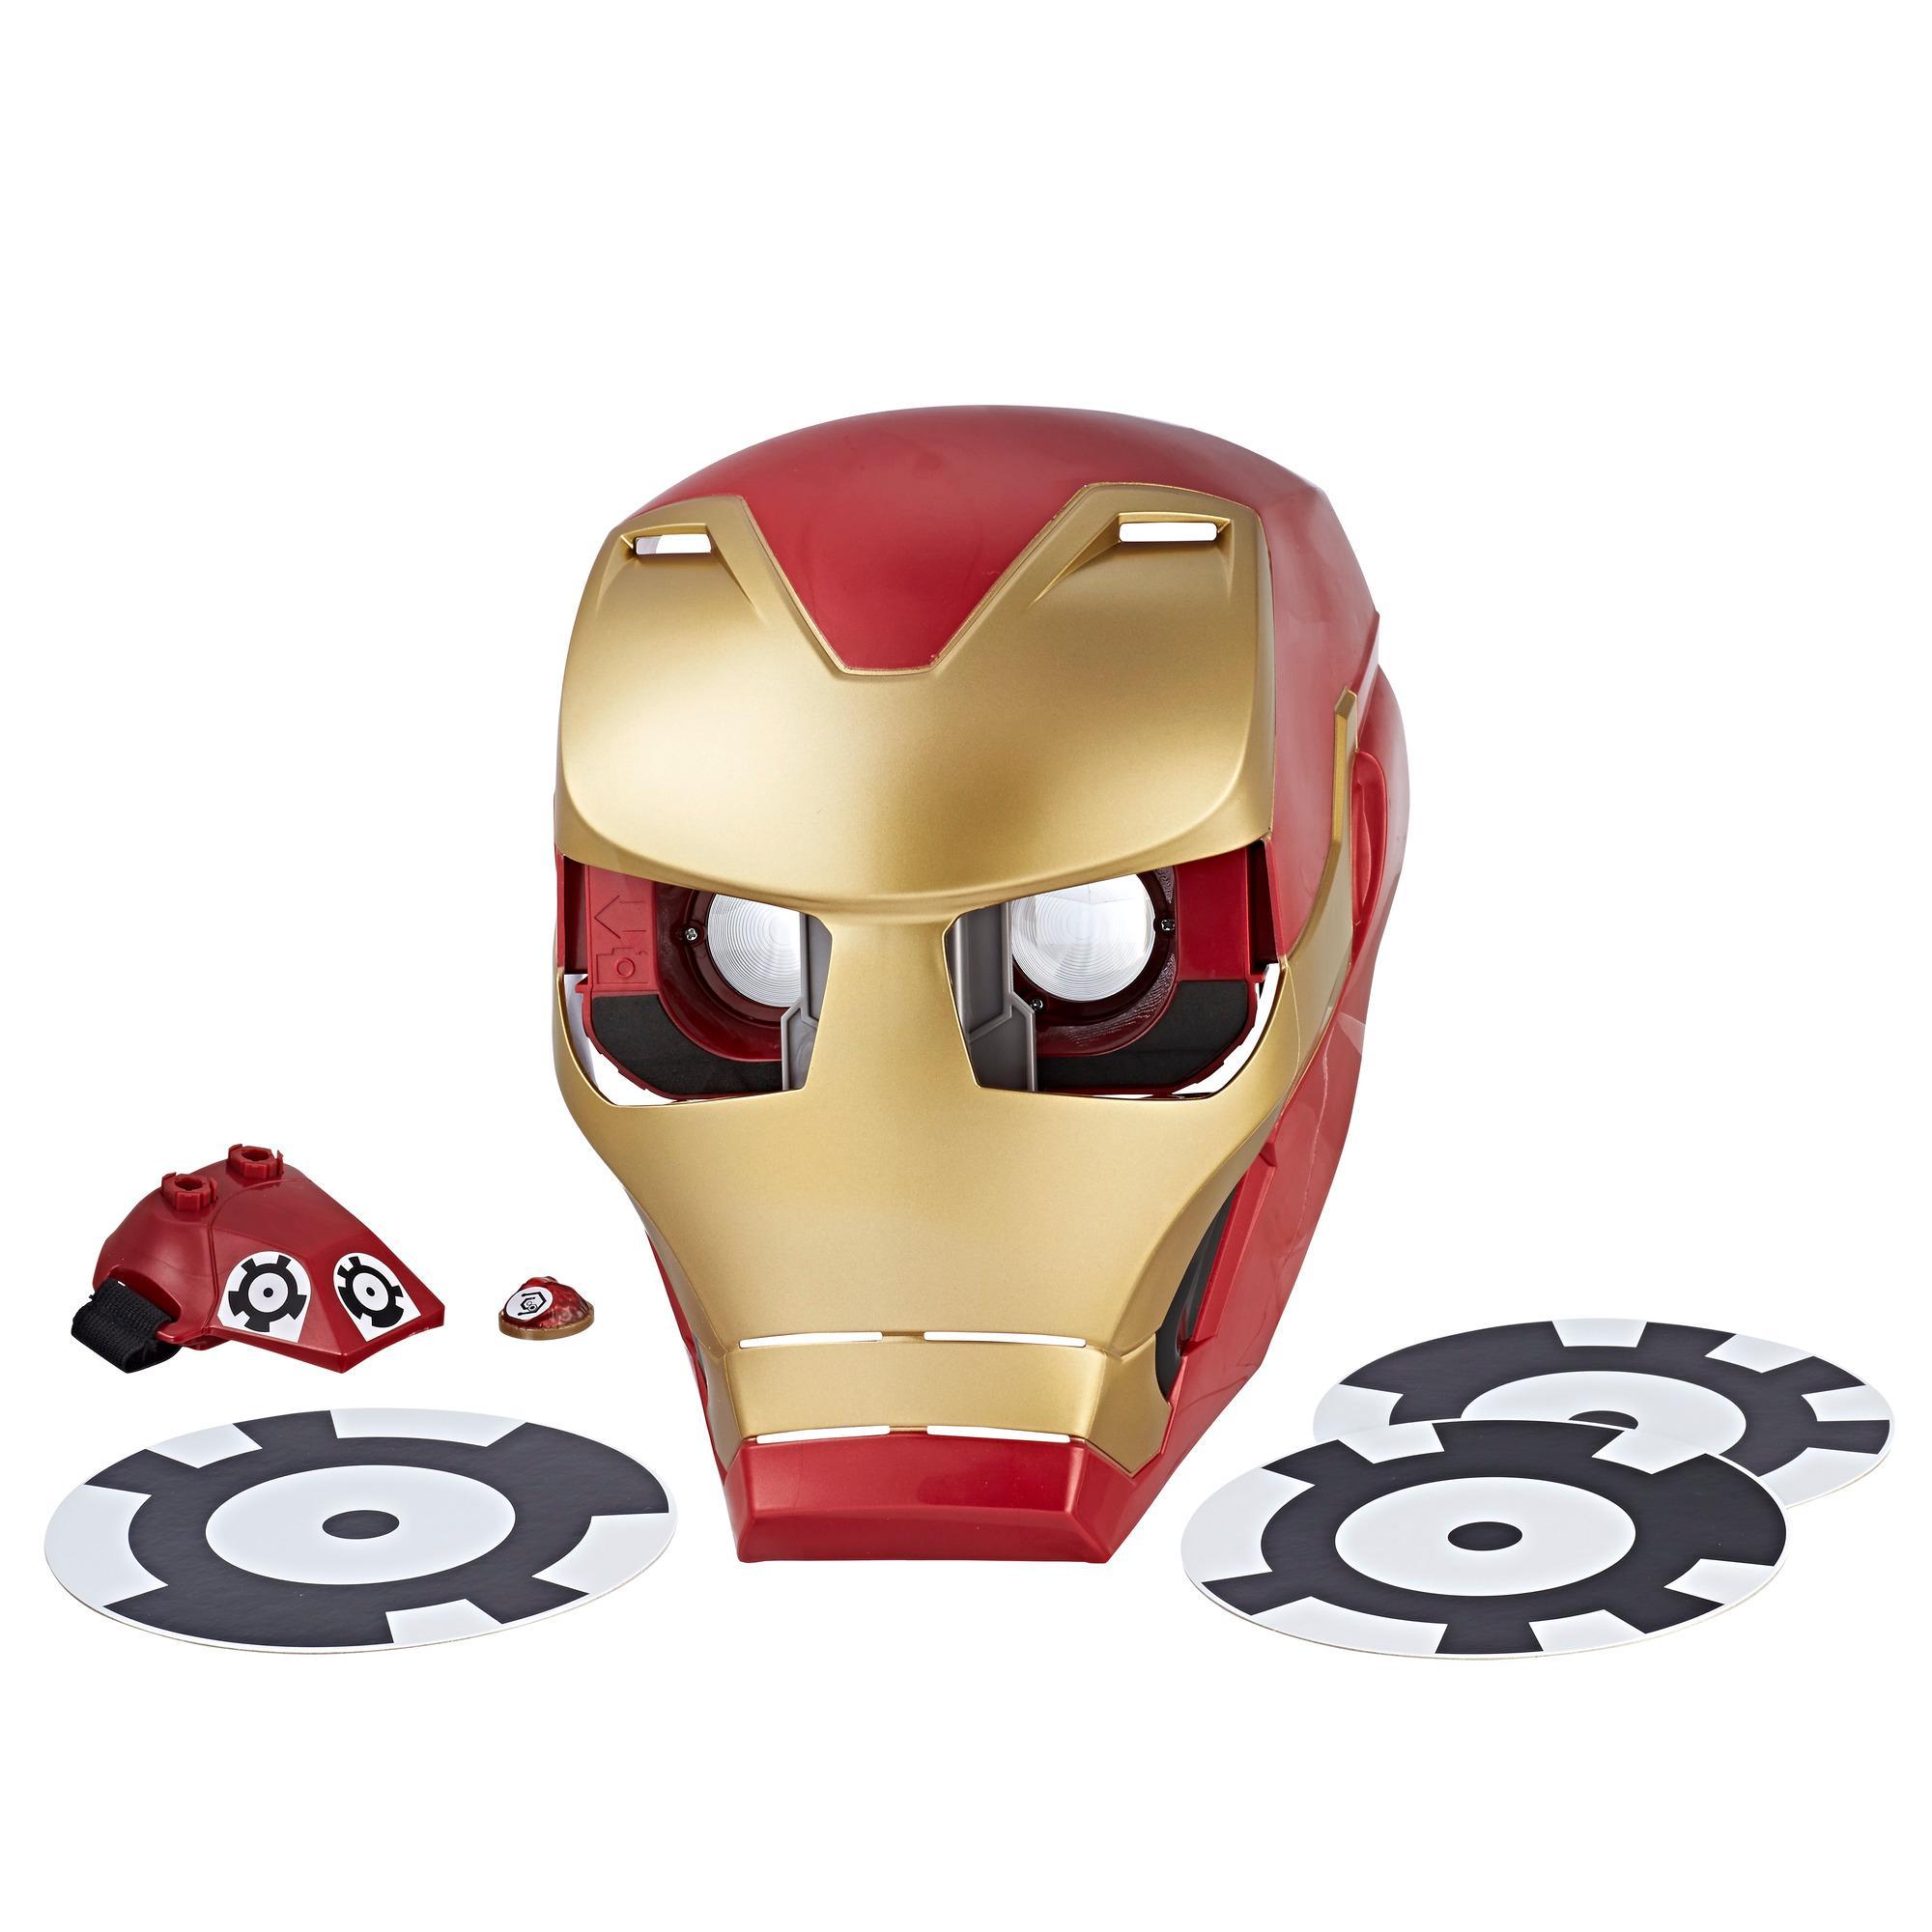 Avengers Hero Vision AR Iron Man Helm